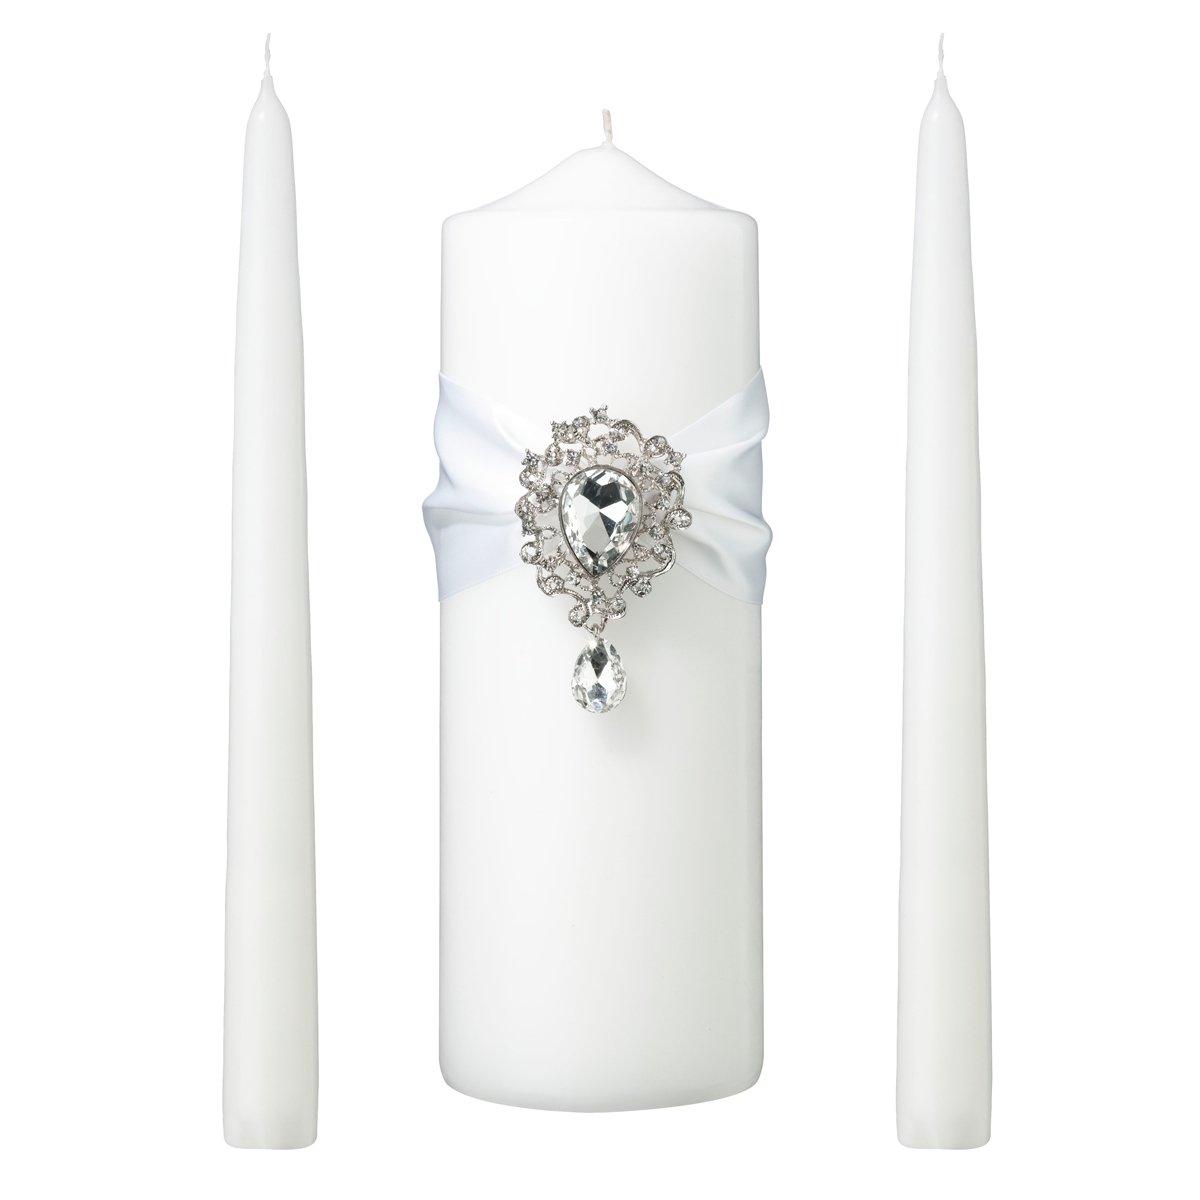 Lillian Rose Jeweled Unity Candle Wedding Ceremony Set, White by Lillian Rose